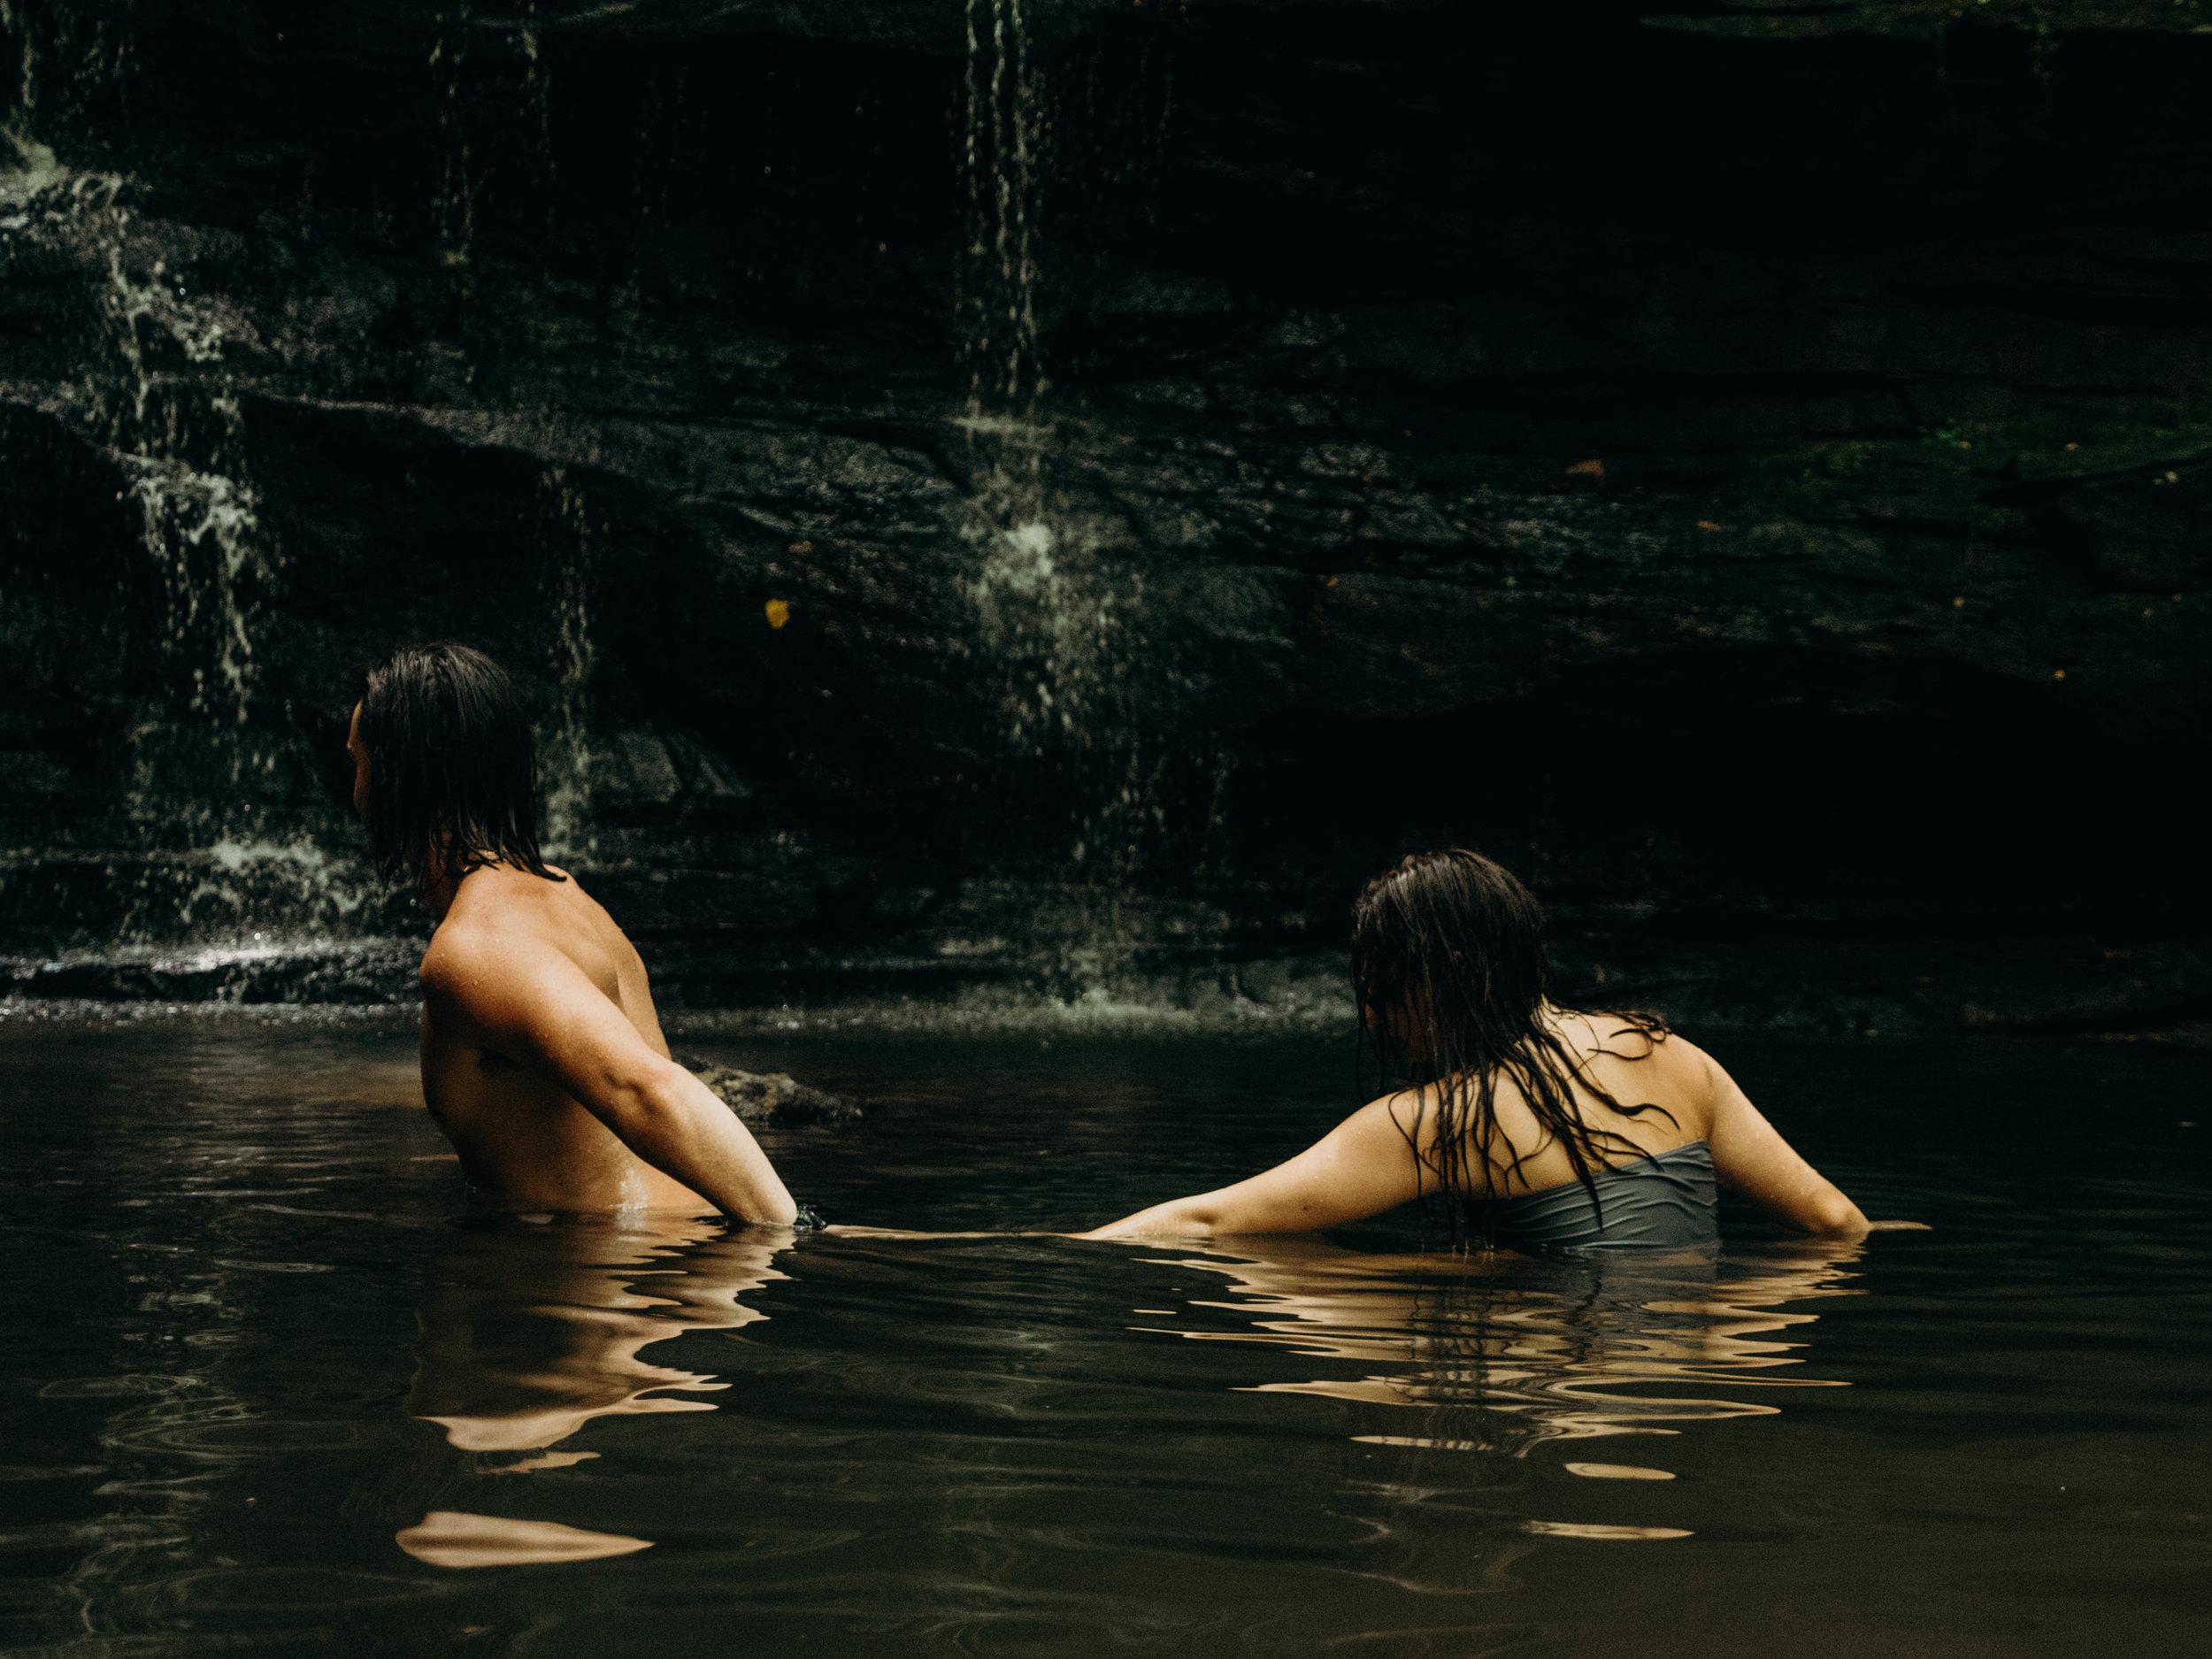 Nightswimming (Photo by  Emilio Machado  on  Unsplash )